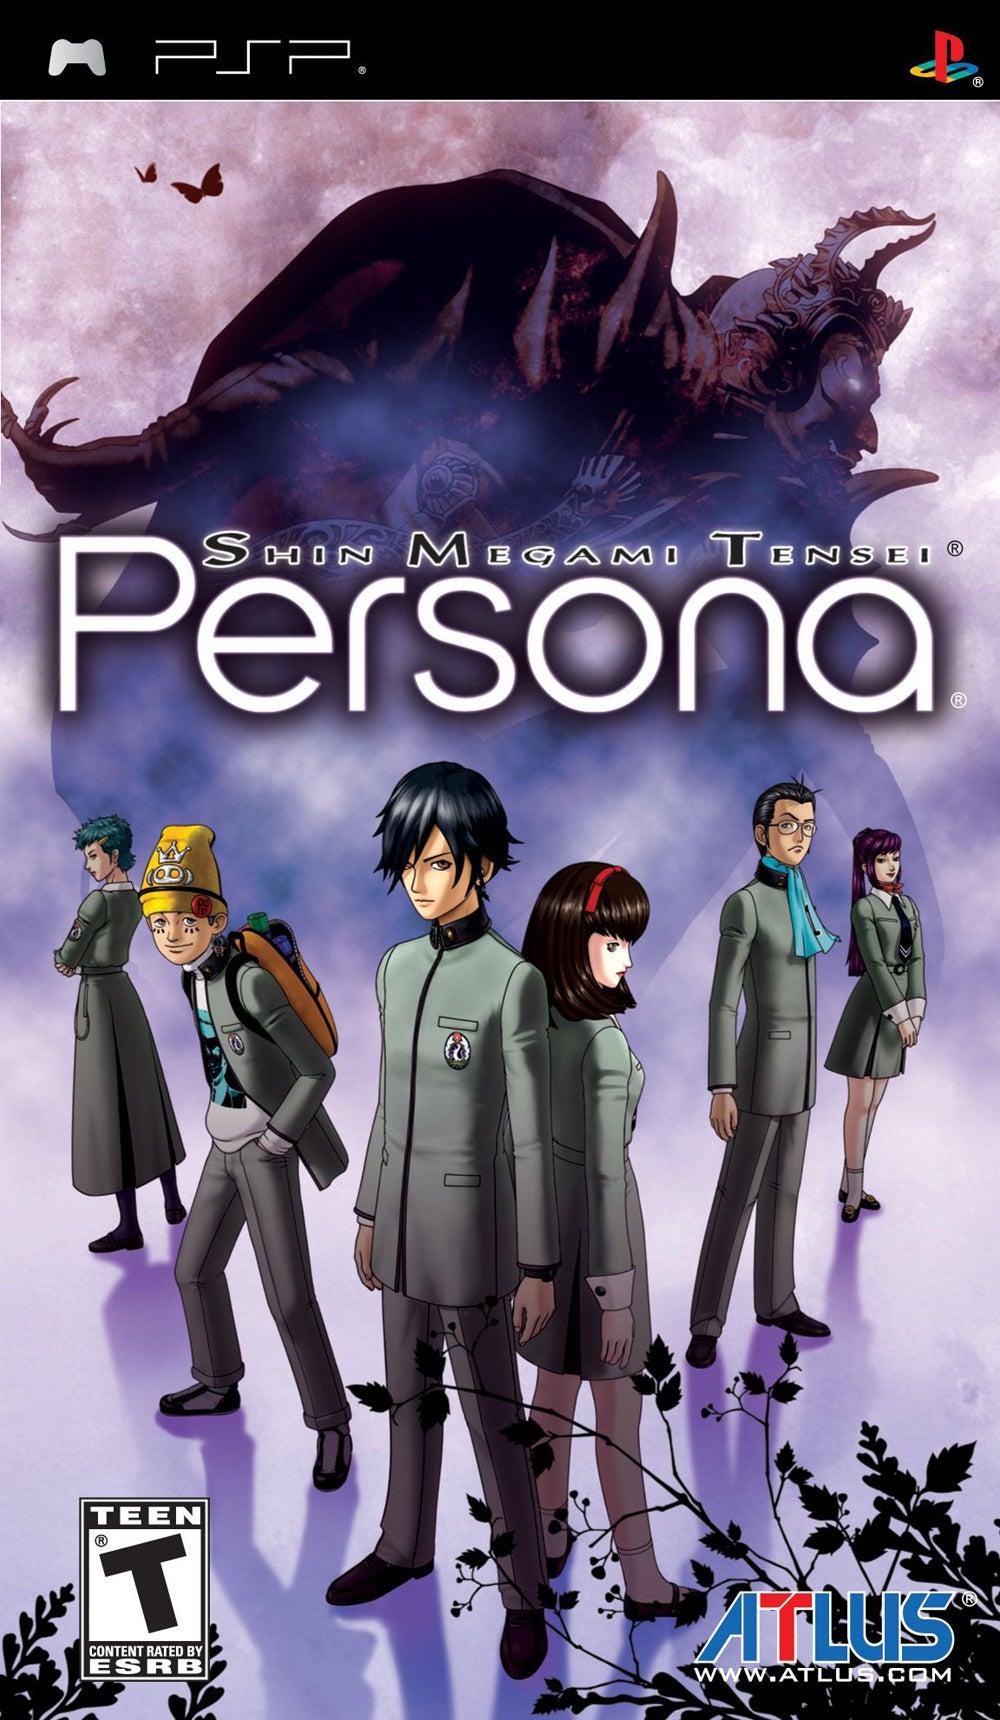 Shin Megami Tensei Persona  PlayStation Portable  IGN